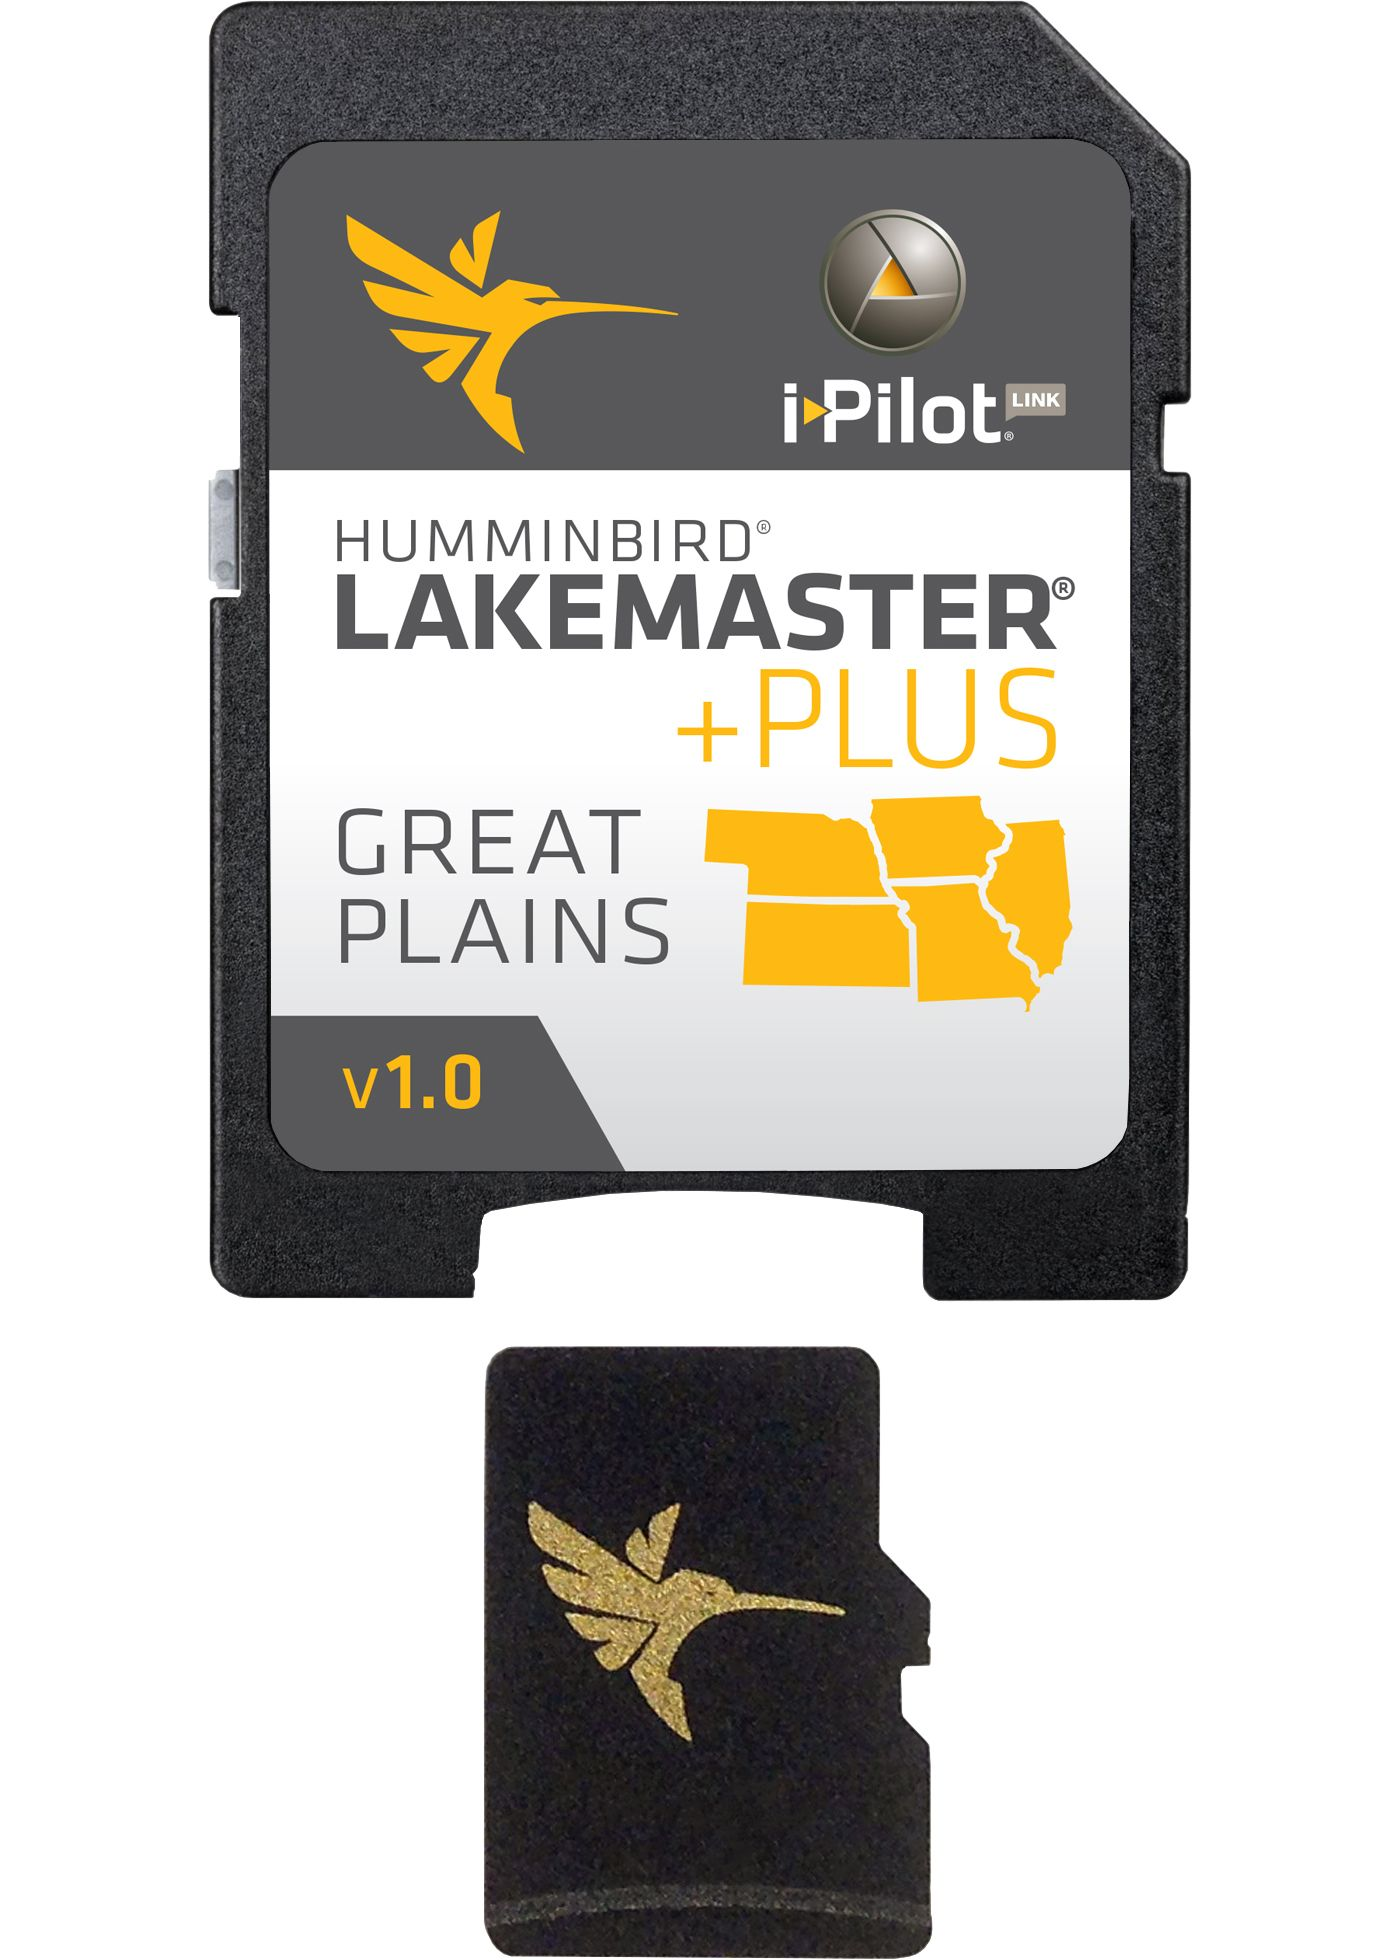 Humminbird Lakemaster PLUS Great Plains Map Card